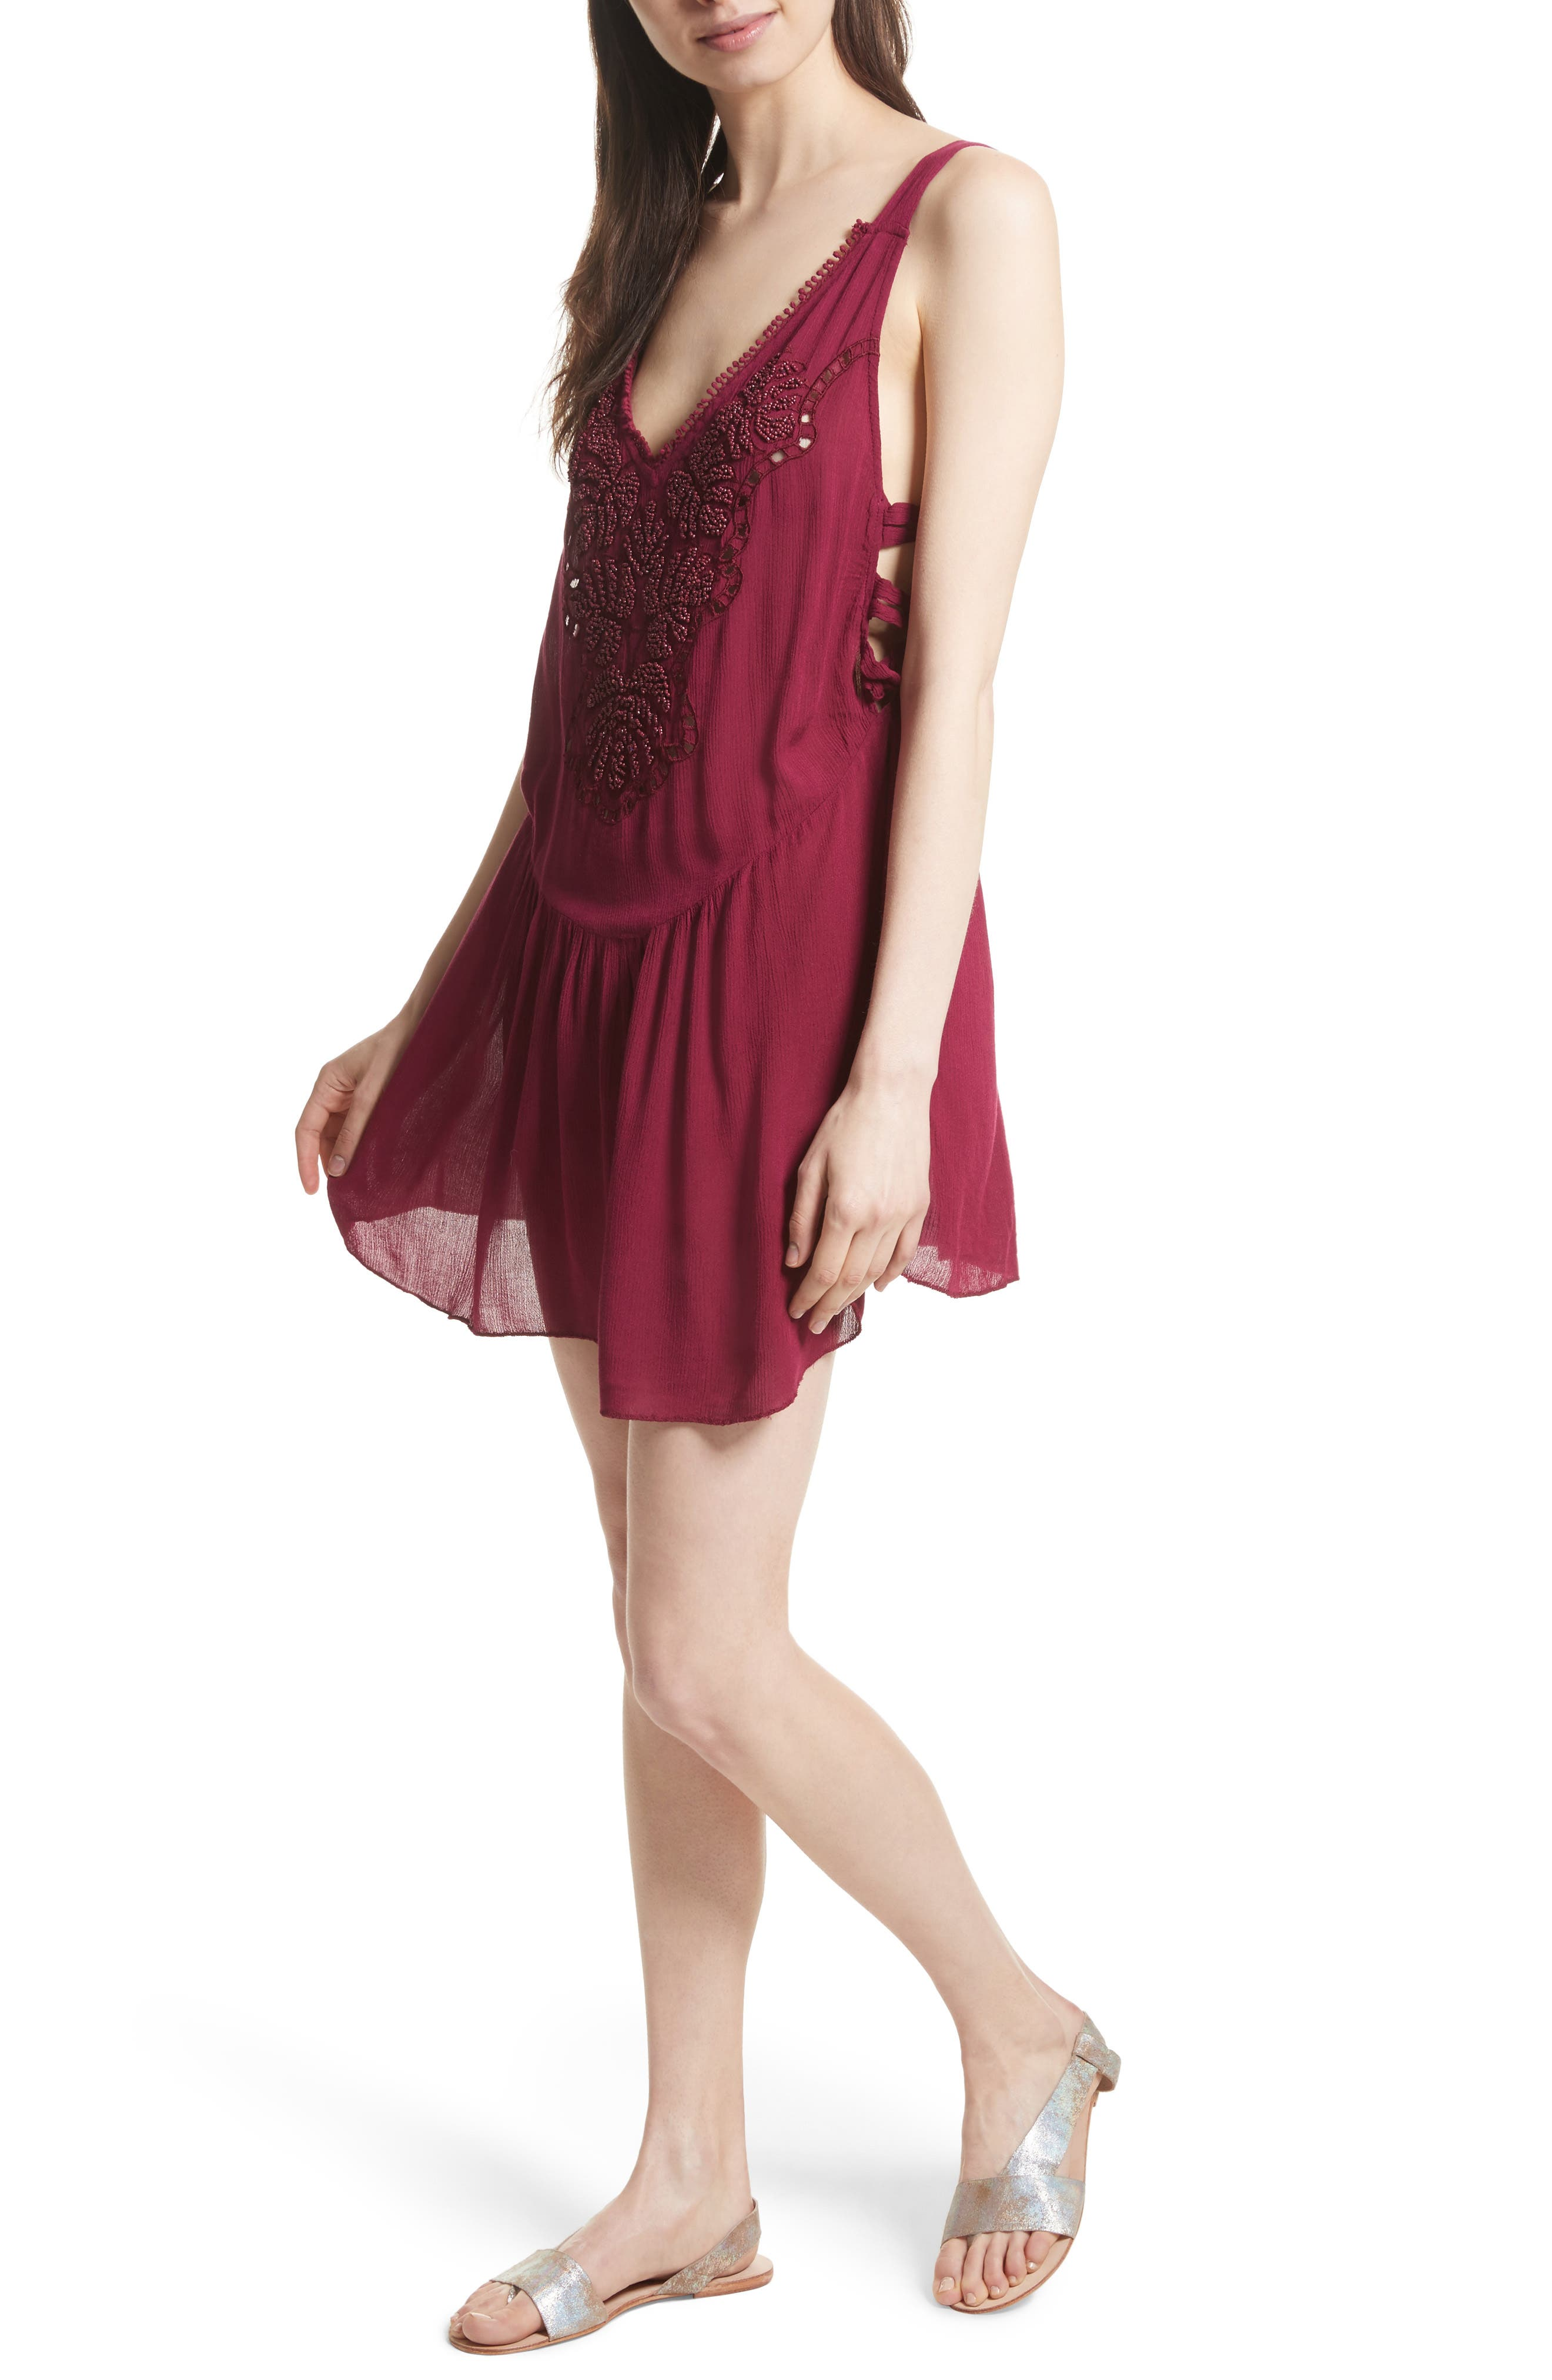 Alternate Image 1 Selected - Free People Delphine Embellished Slipdress